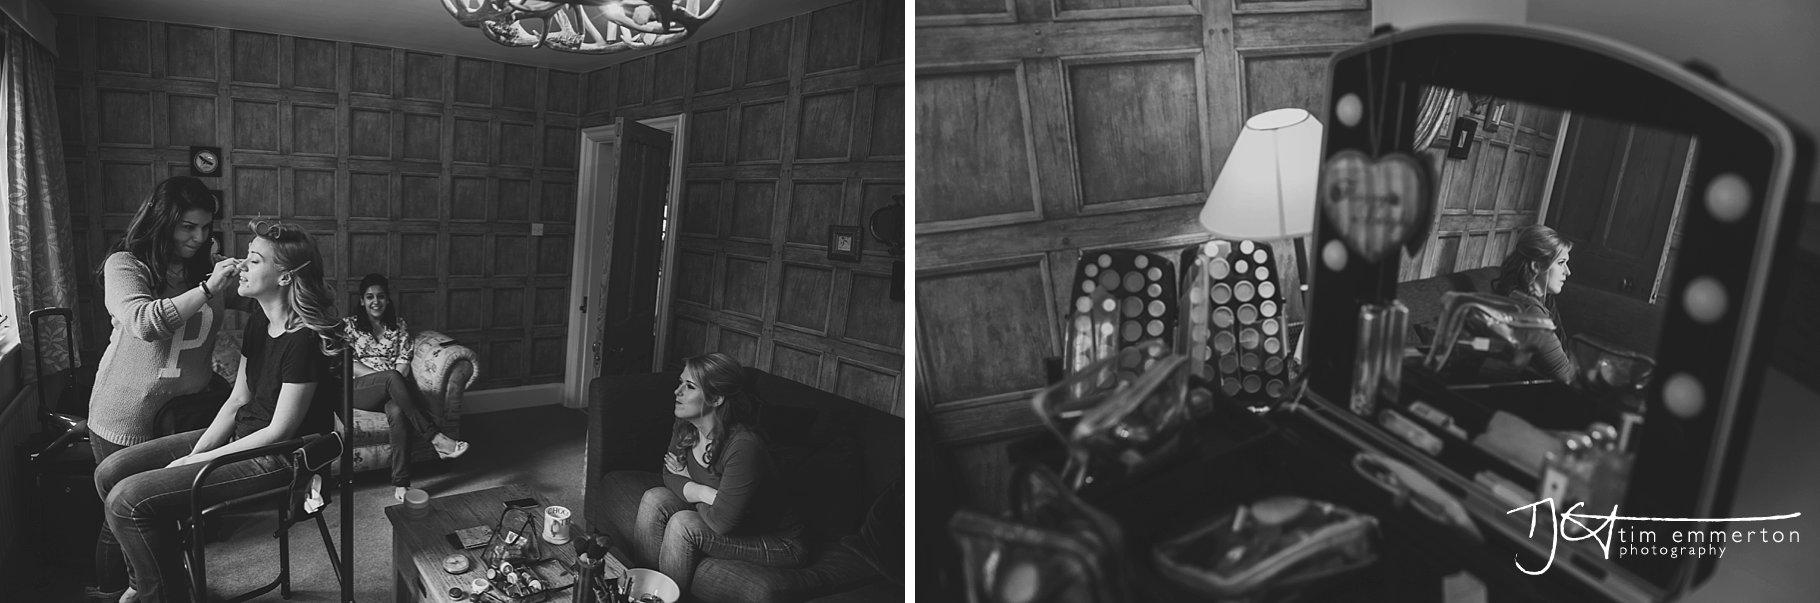 Eaves-Hall-Wedding-Photographer-008.jpg